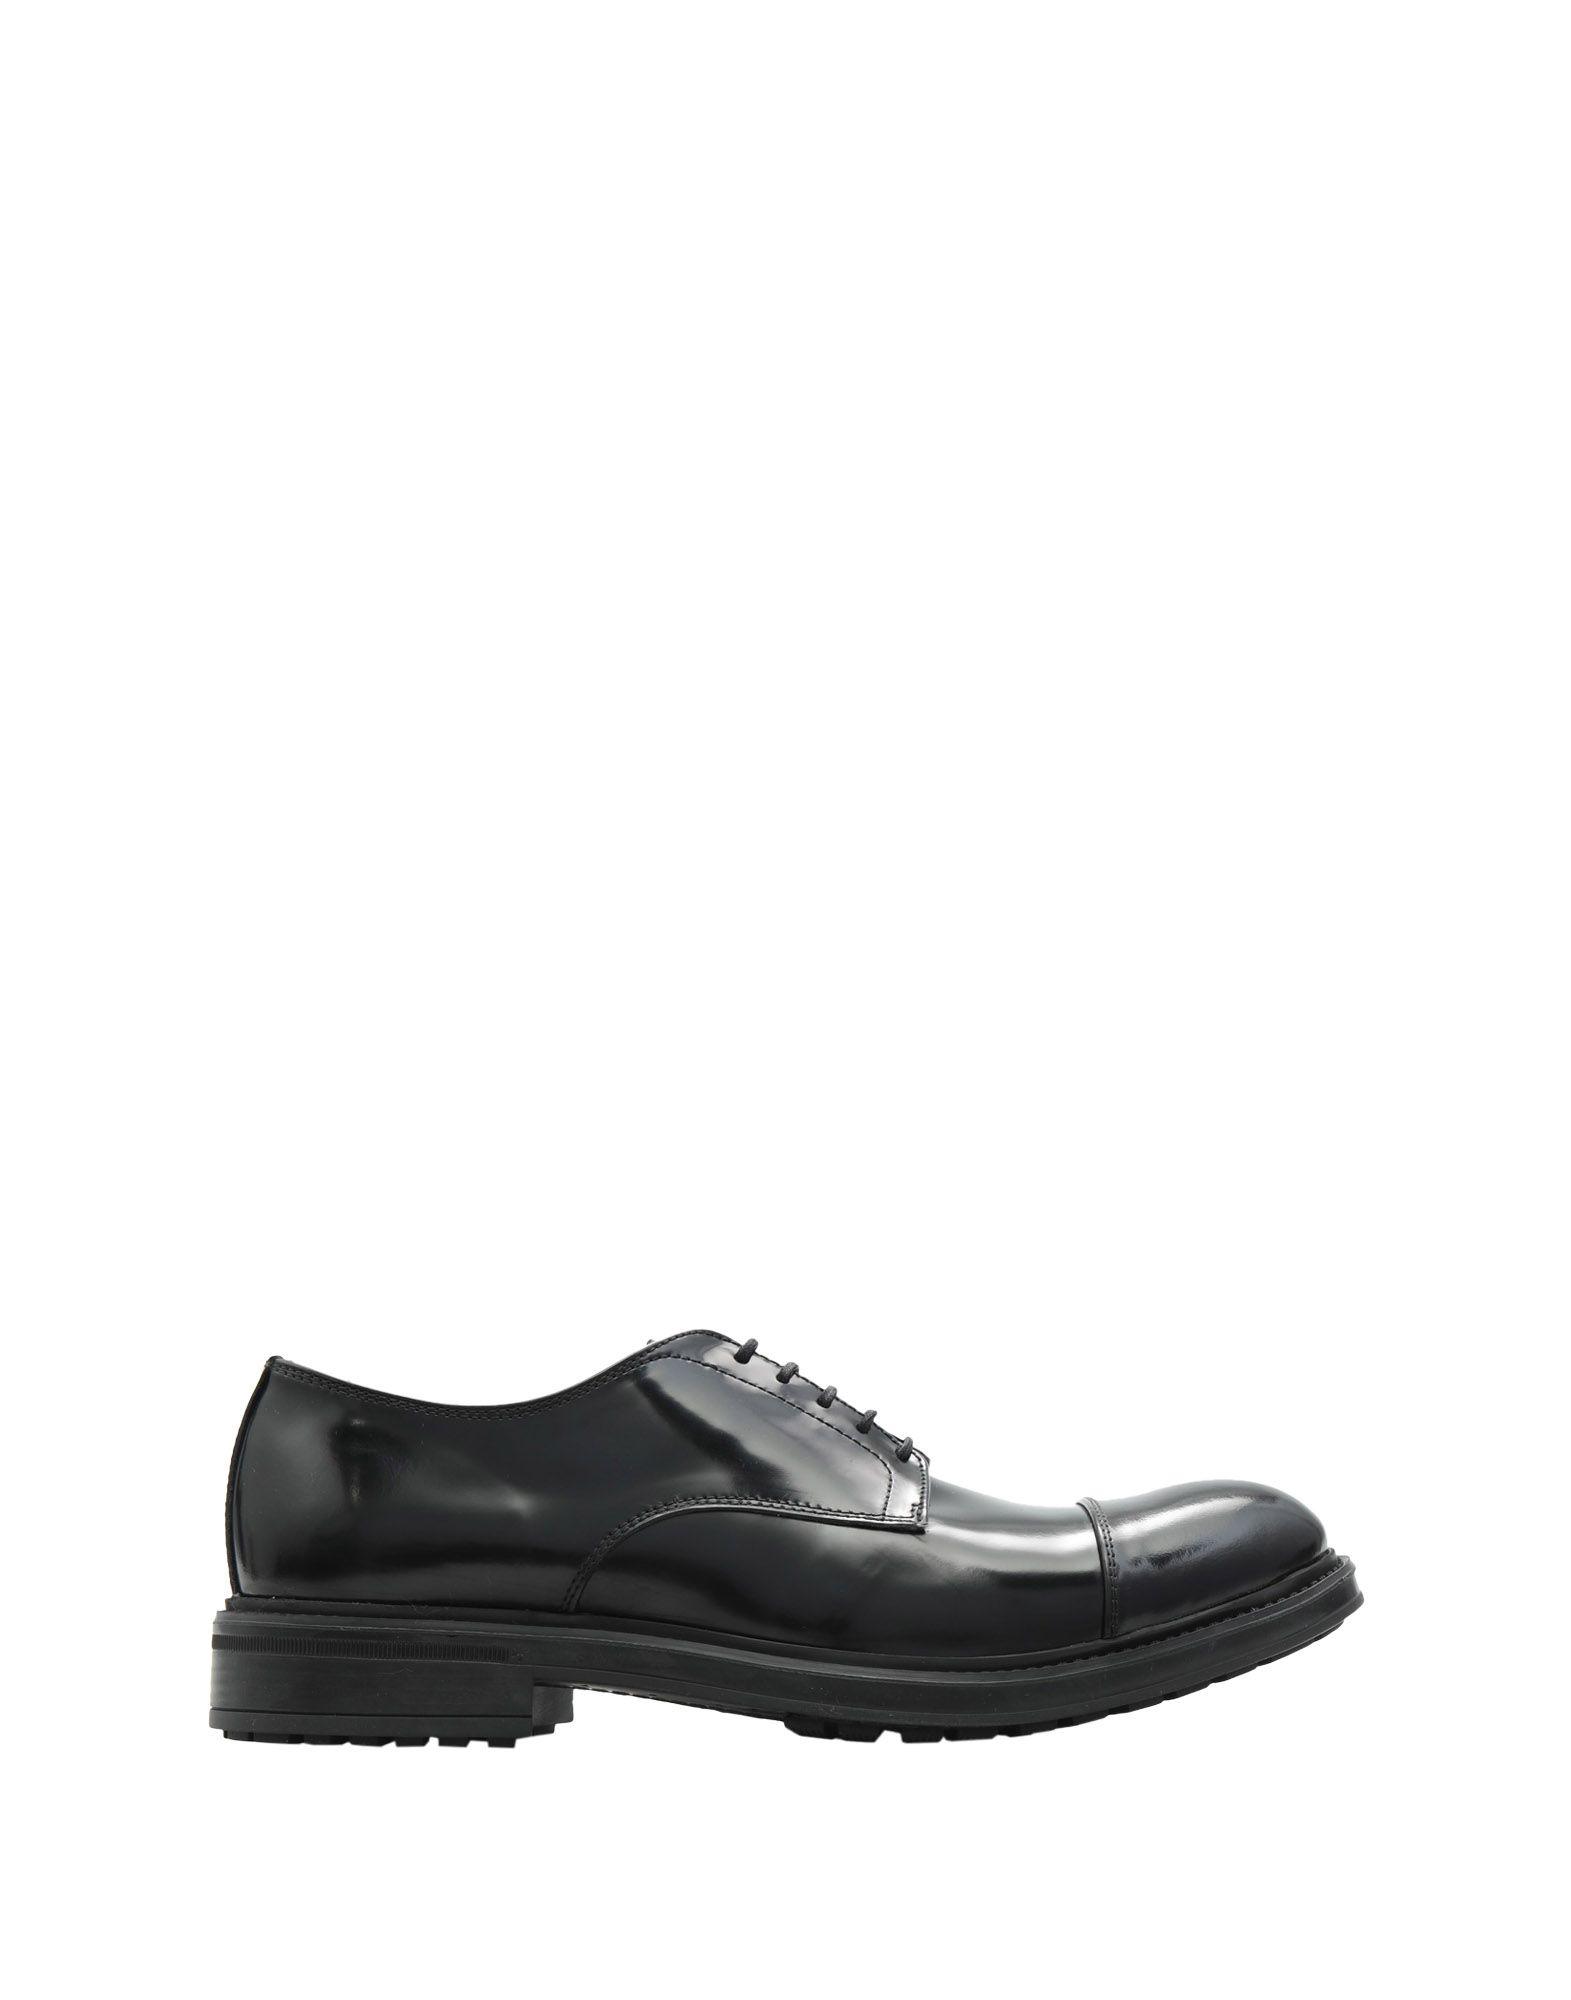 Eveet Schnürschuhe Herren  11524645AN Gute Qualität beliebte Schuhe